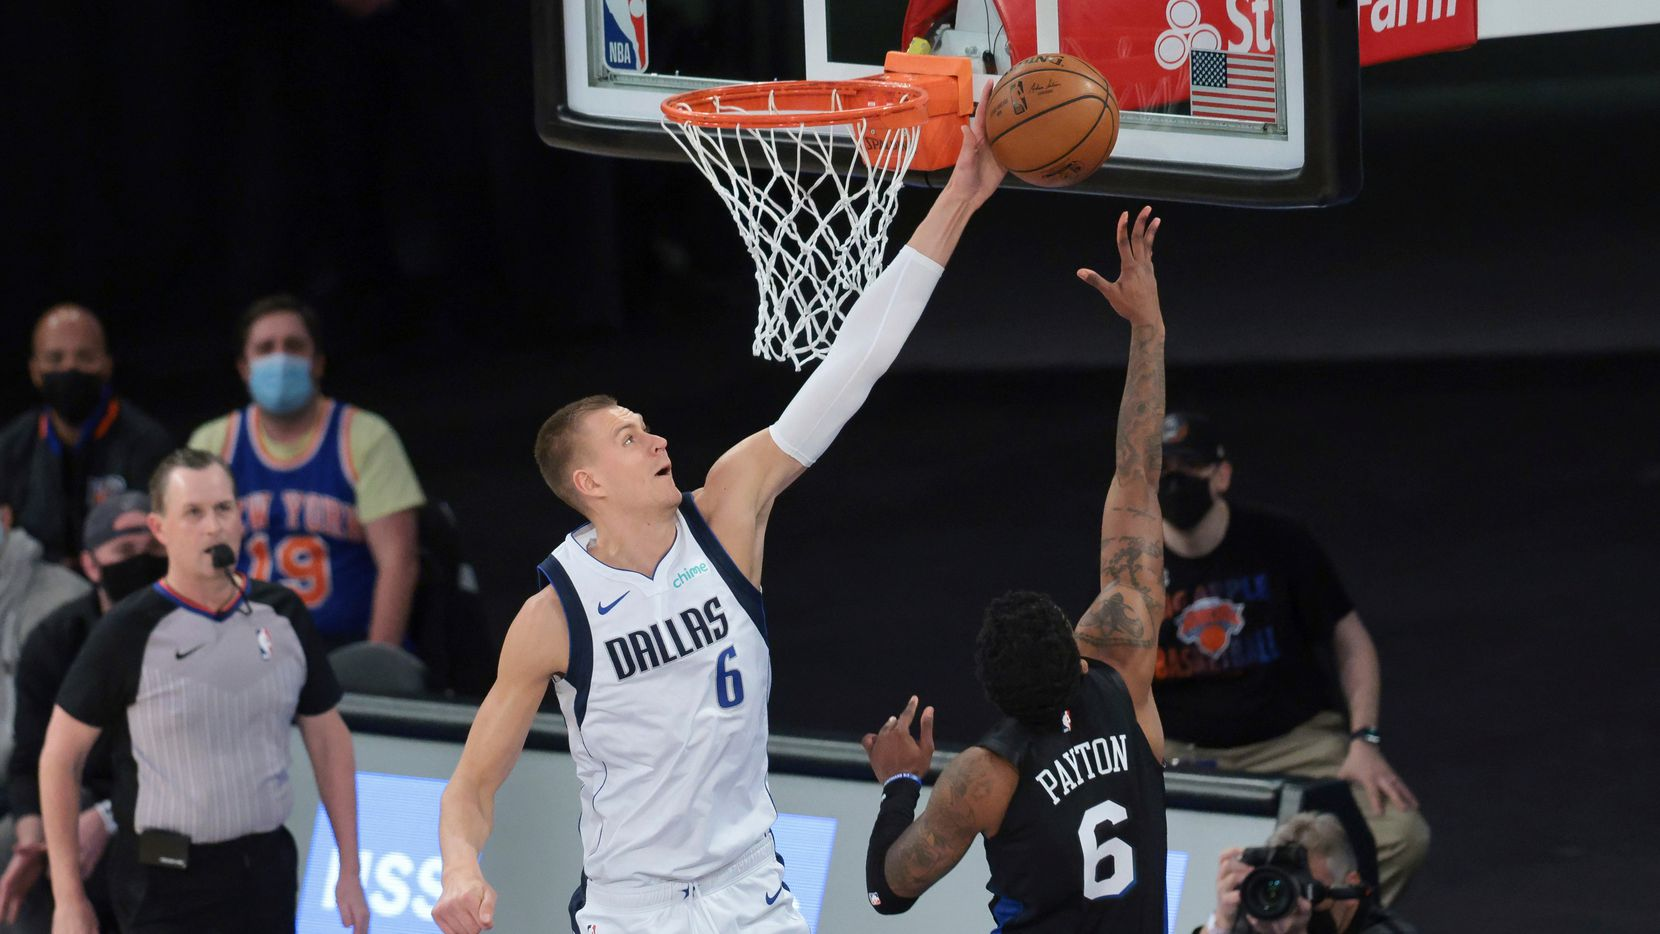 Dallas Mavericks center Kristaps Porzingis (6) blocks a shot by New York Knicks guard Elfrid Payton (6) during the first quarter of an NBA basketball game Friday, April 2, 2021, in New York.